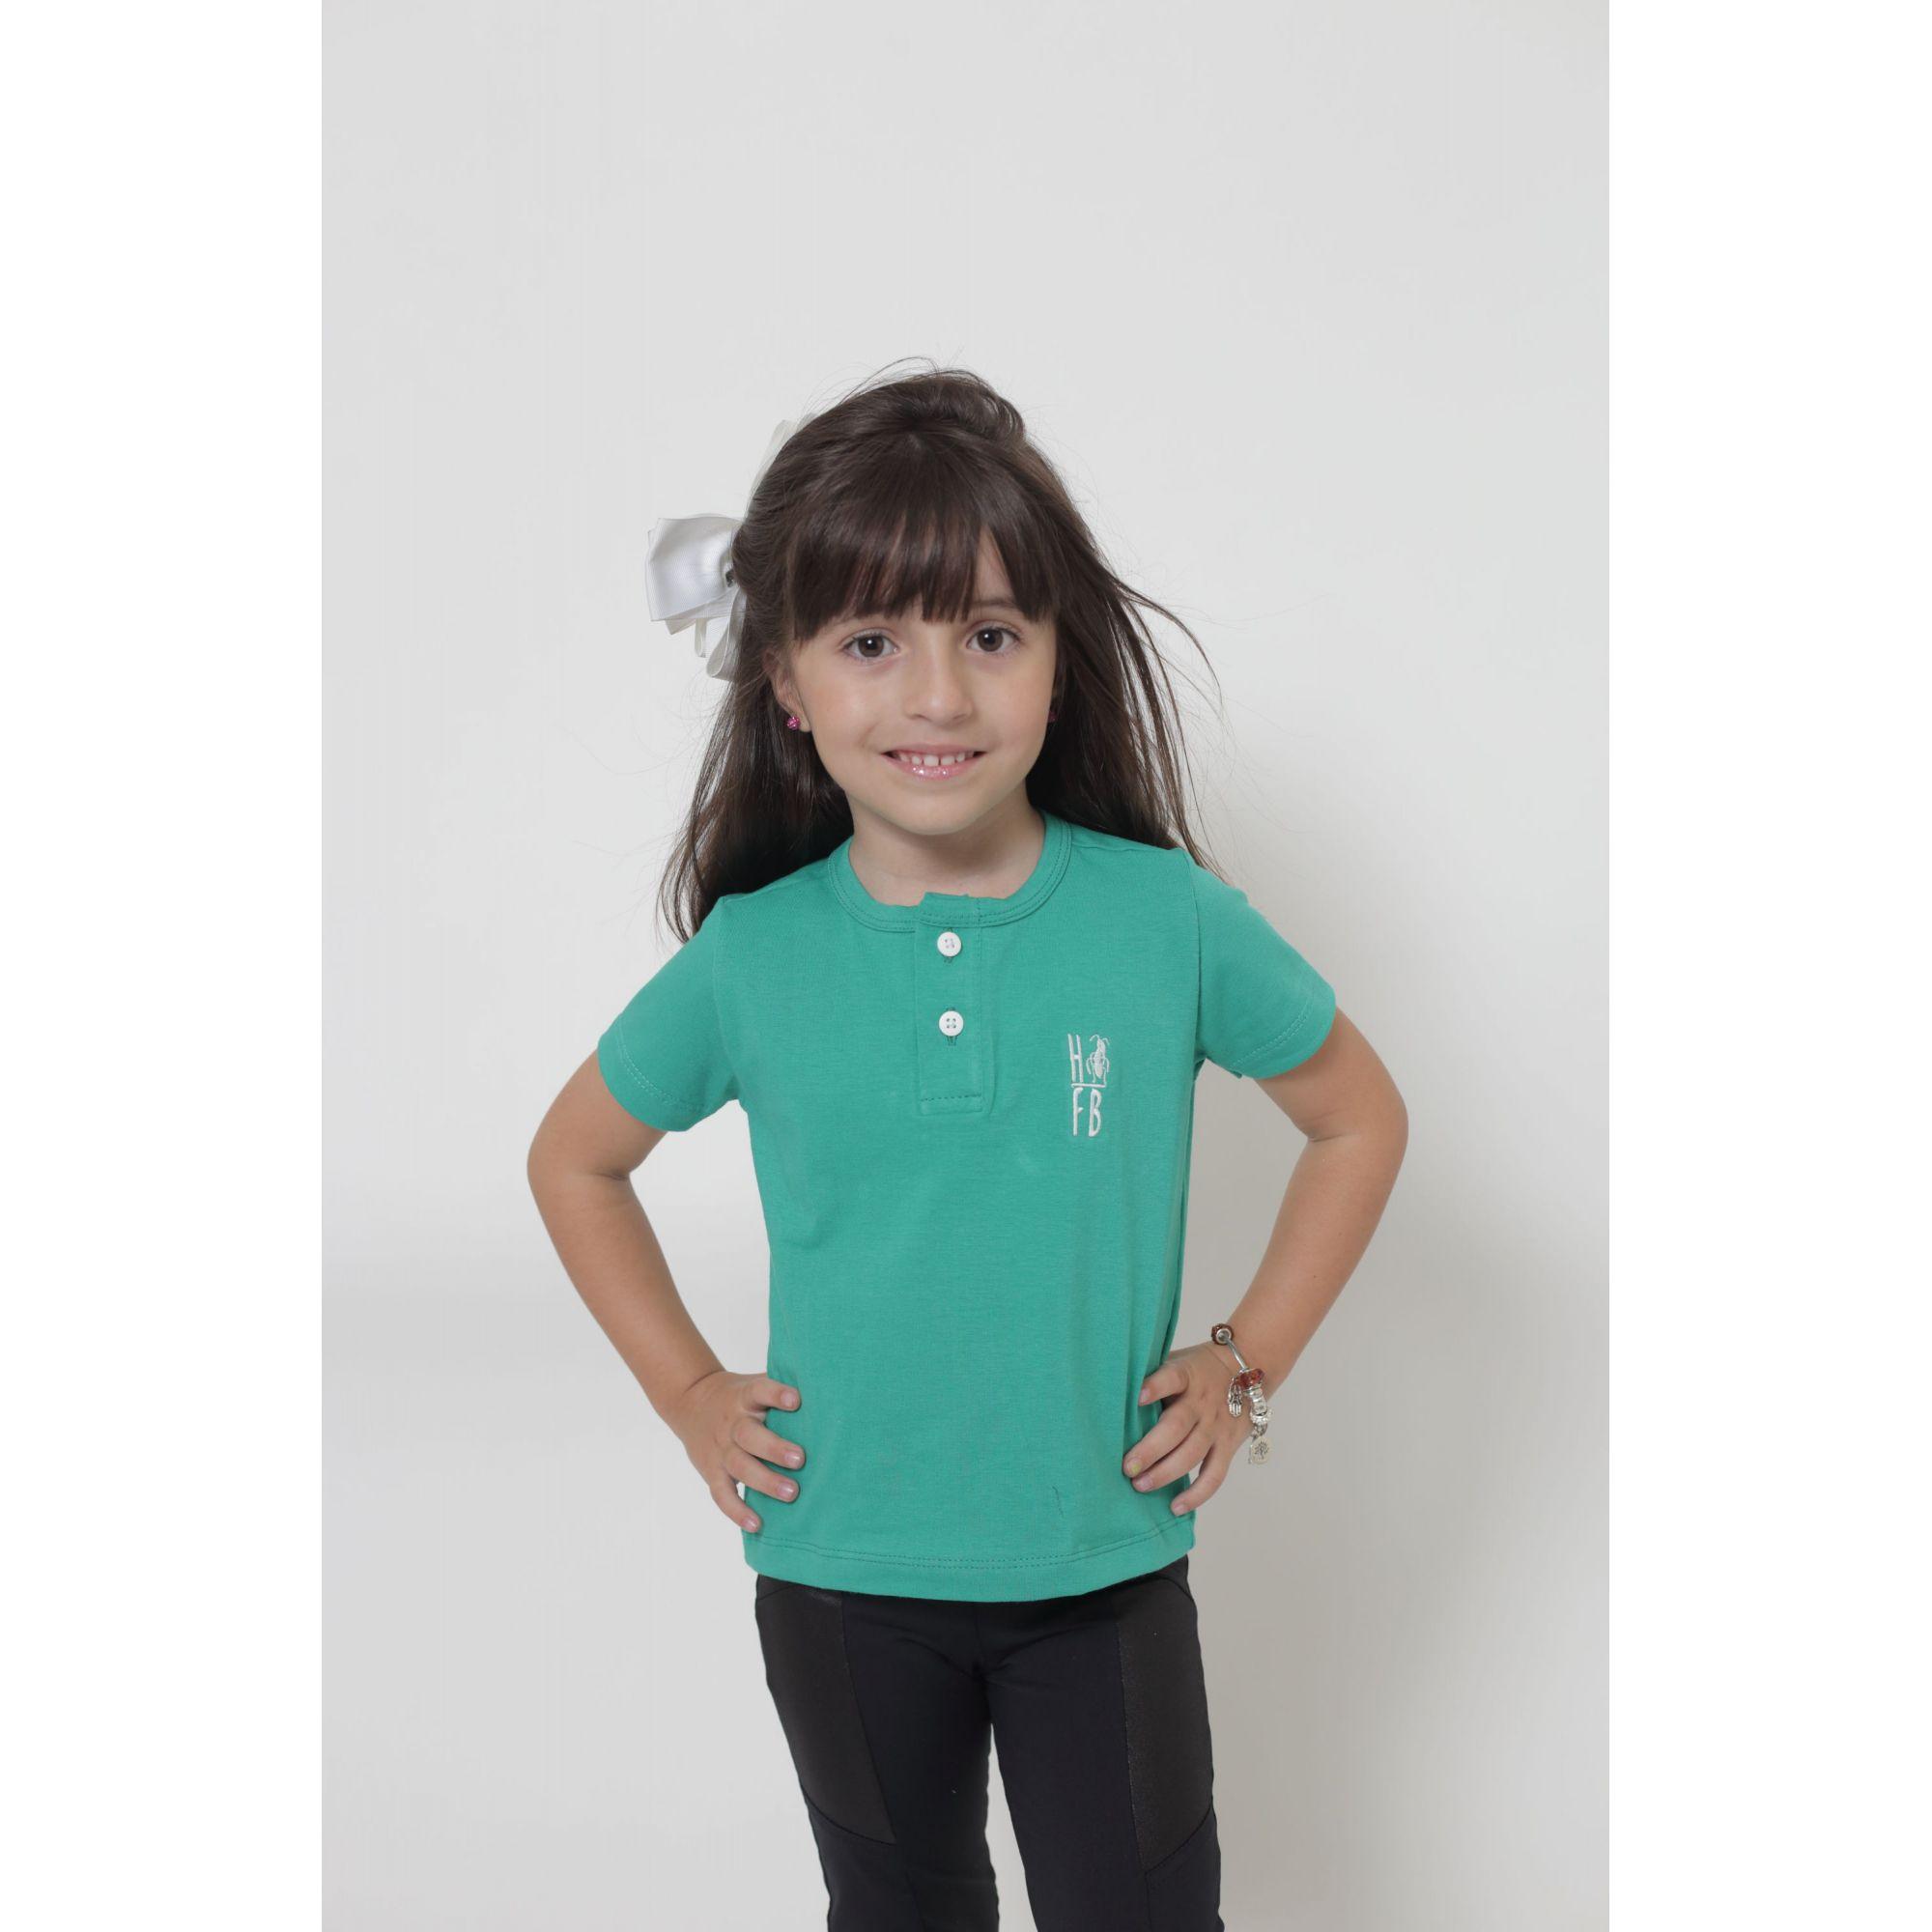 PAI E FILHA > 02 T-Shirts ou Body Henley - Verde Jade  [Coleção Tal Pai Tal Filha]  - Heitor Fashion Brazil